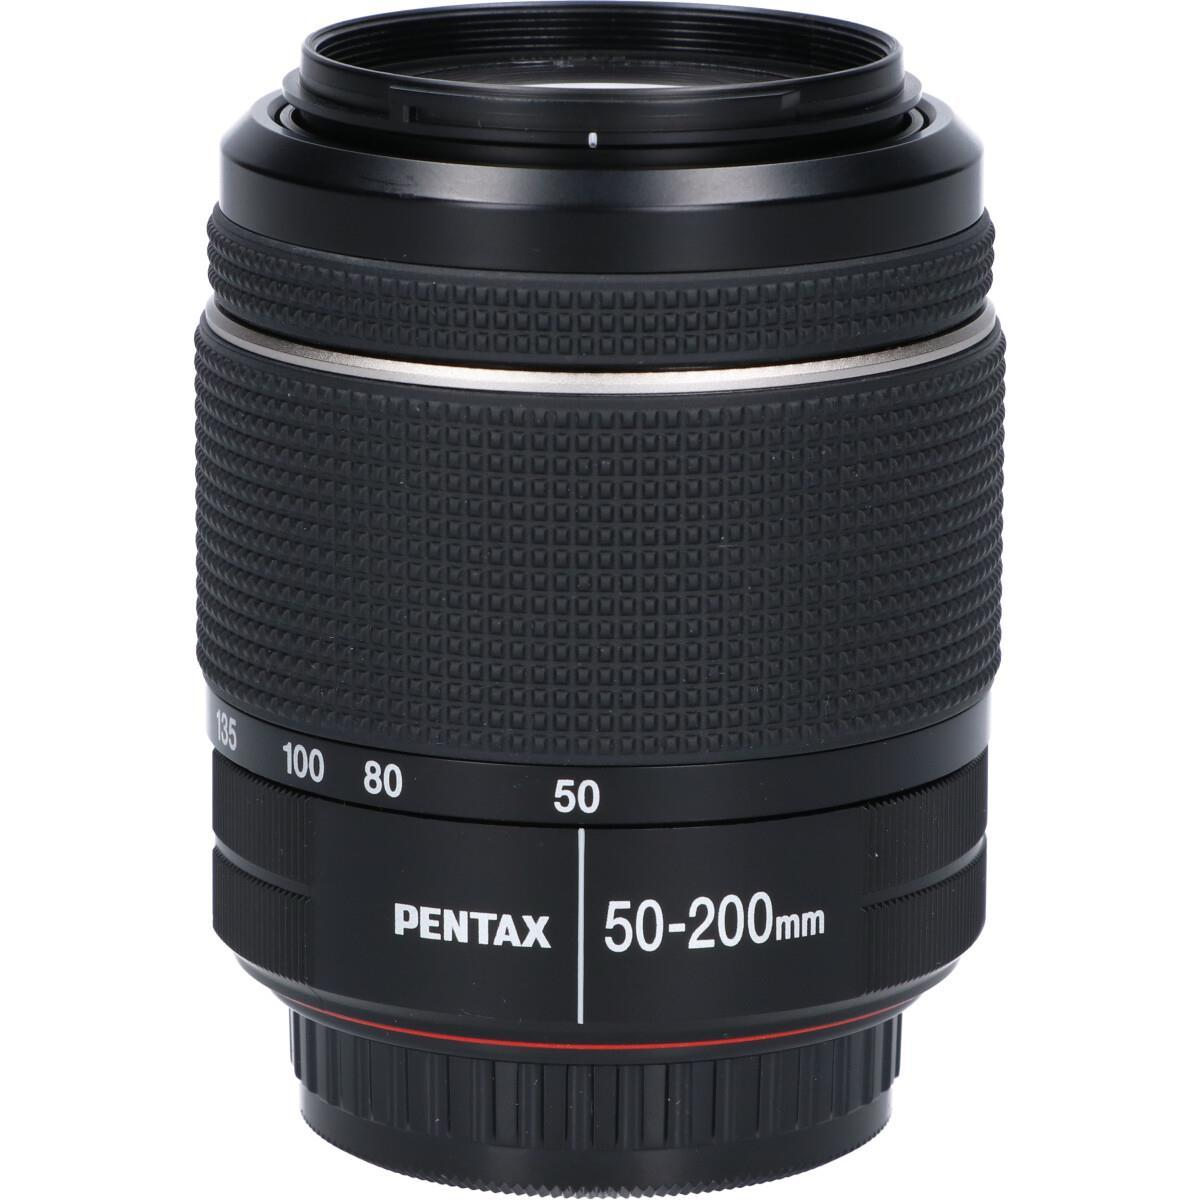 PENTAX DAL50-200mm F4-5.6ED WR